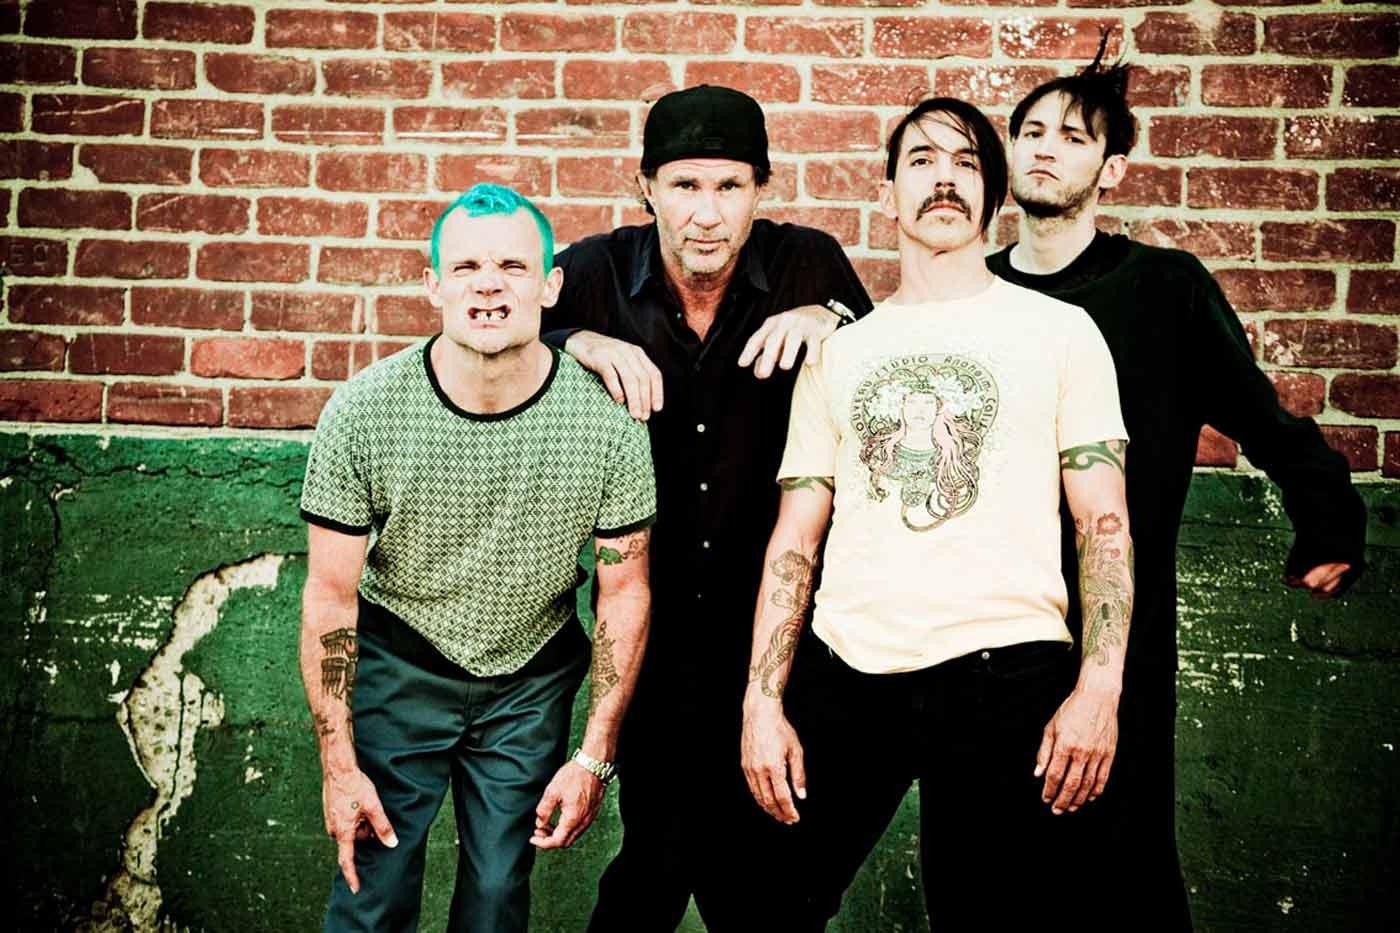 Una I.A. reconstruye a Red Hot Chili Peppers, R.A.T.M. y muchos más